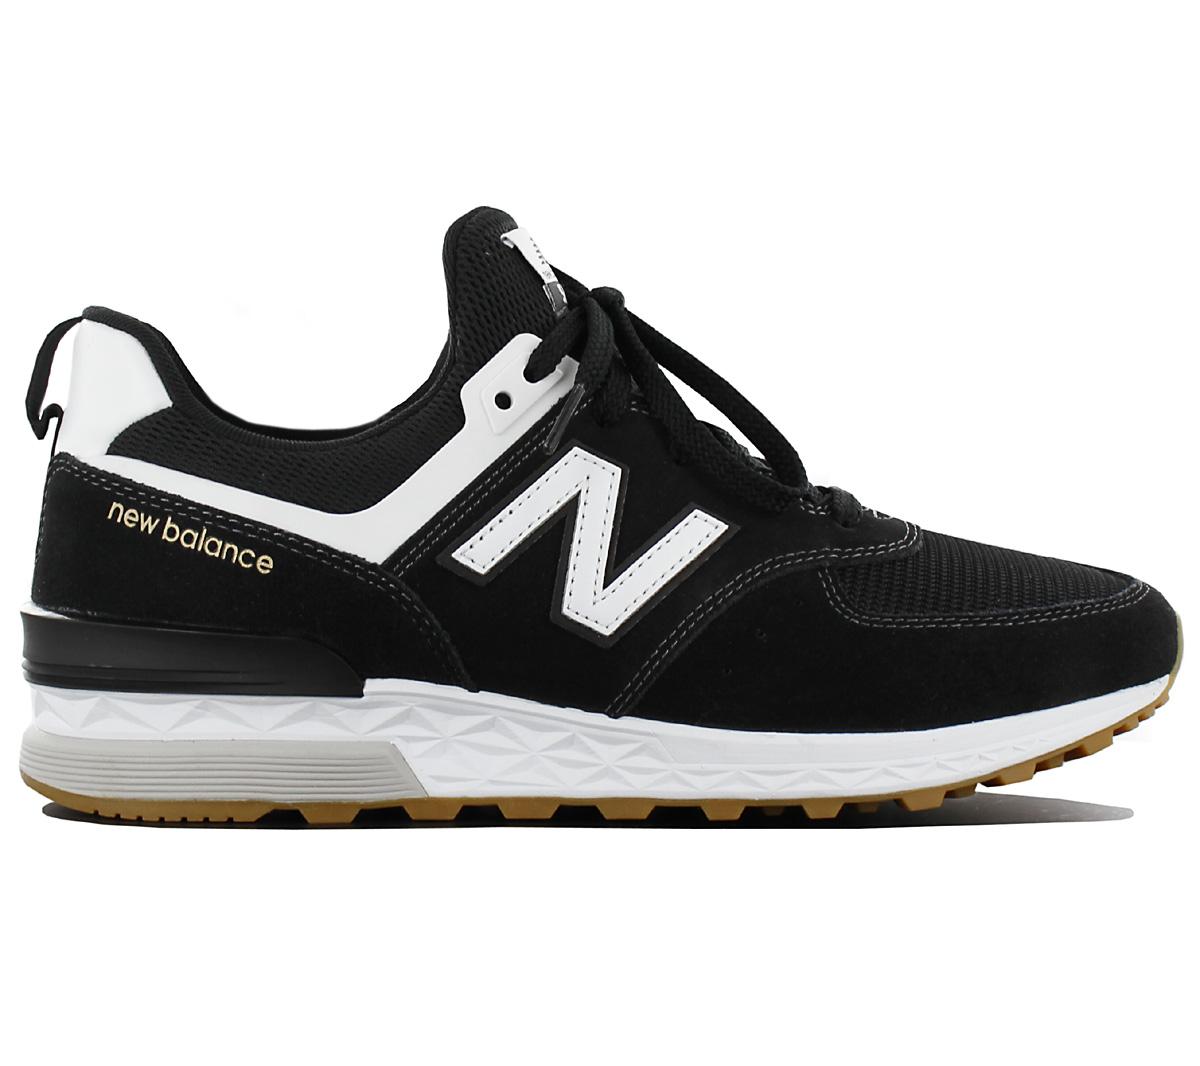 c7fcdf7d2ec596 New Balance Lifestyle 574 MS574FCB Herren Sneaker Schuhe Turnschuhe ...